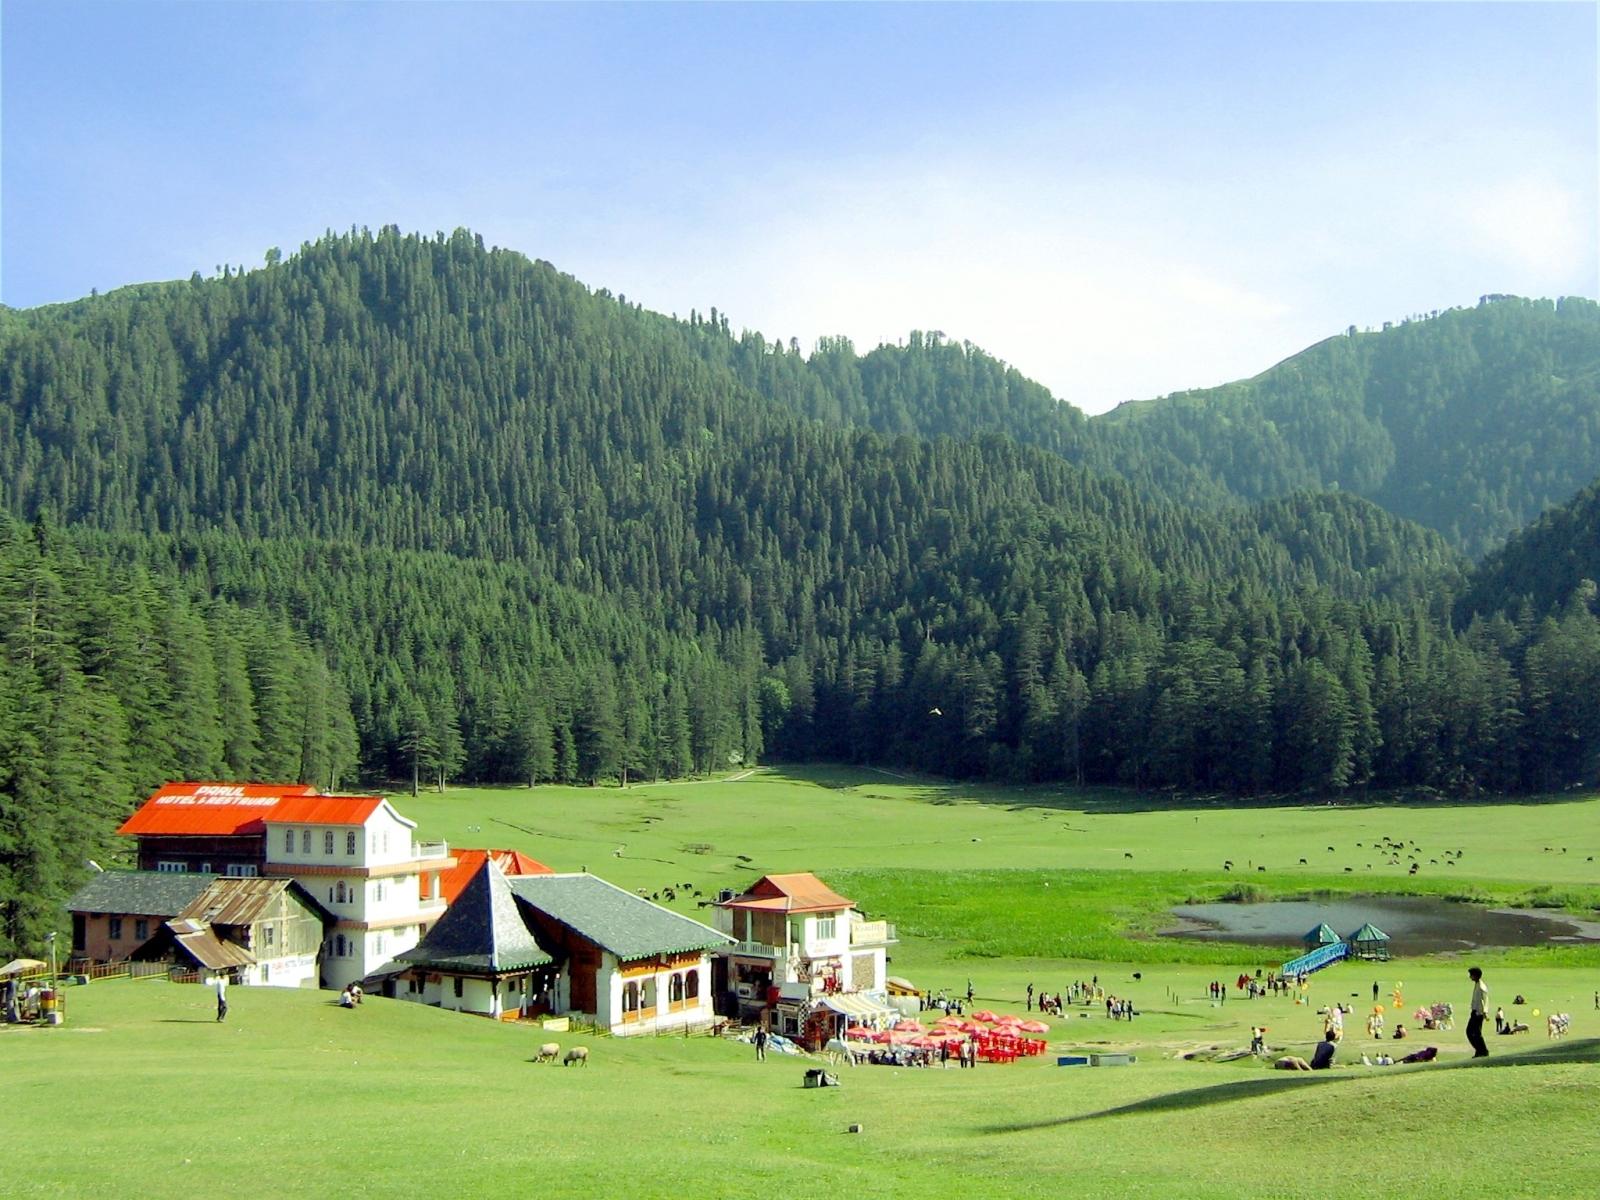 Khajjiar-Chamba-Trvldy.com